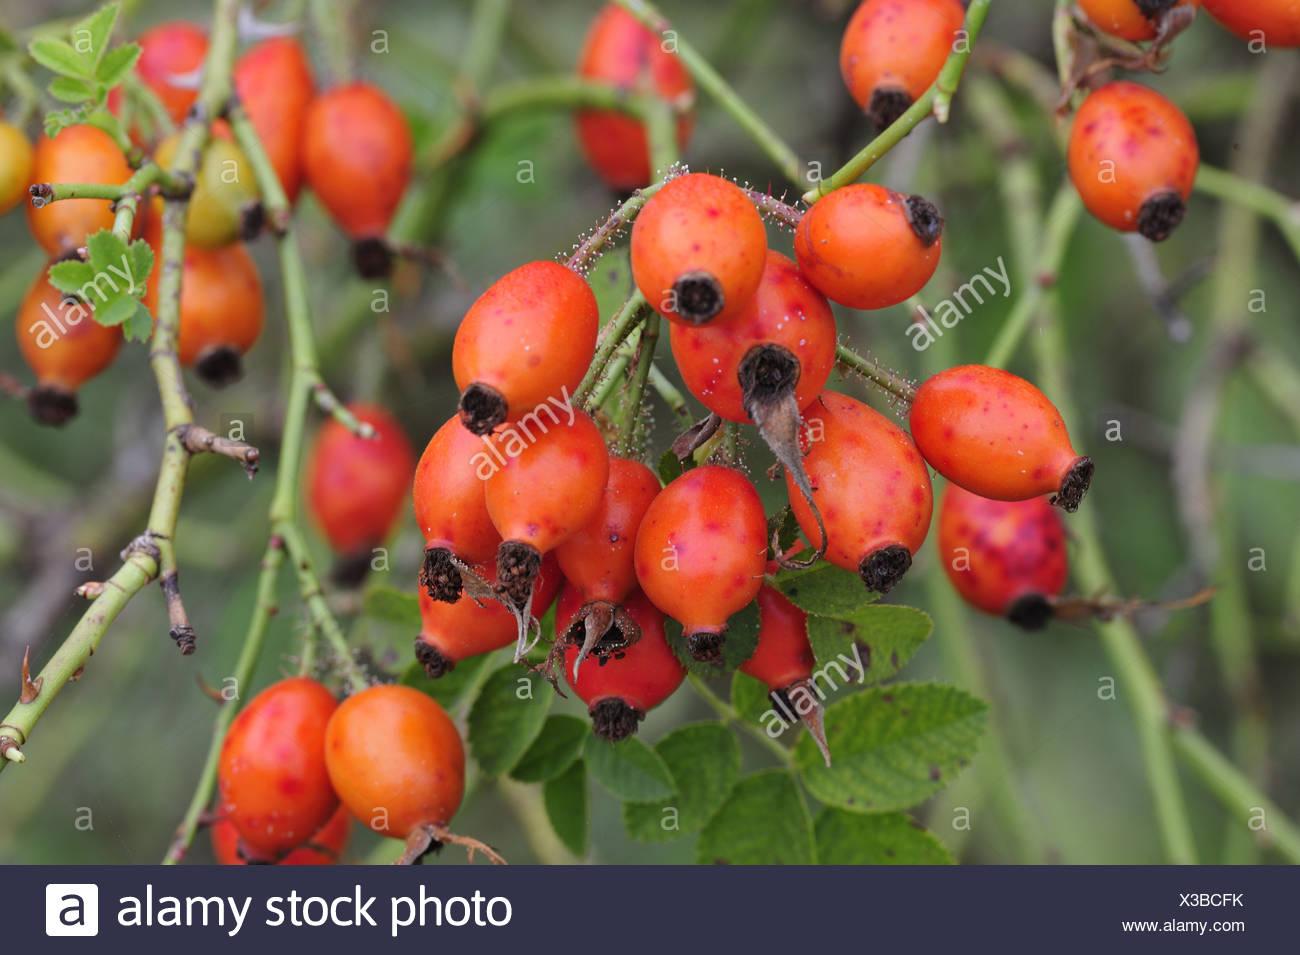 Wild roses, dog-rose, rose, Rosaceae, hip, haw, plant, fruits, Damphreux, Ajoie, Canton, Jura, Switzerland - Stock Image